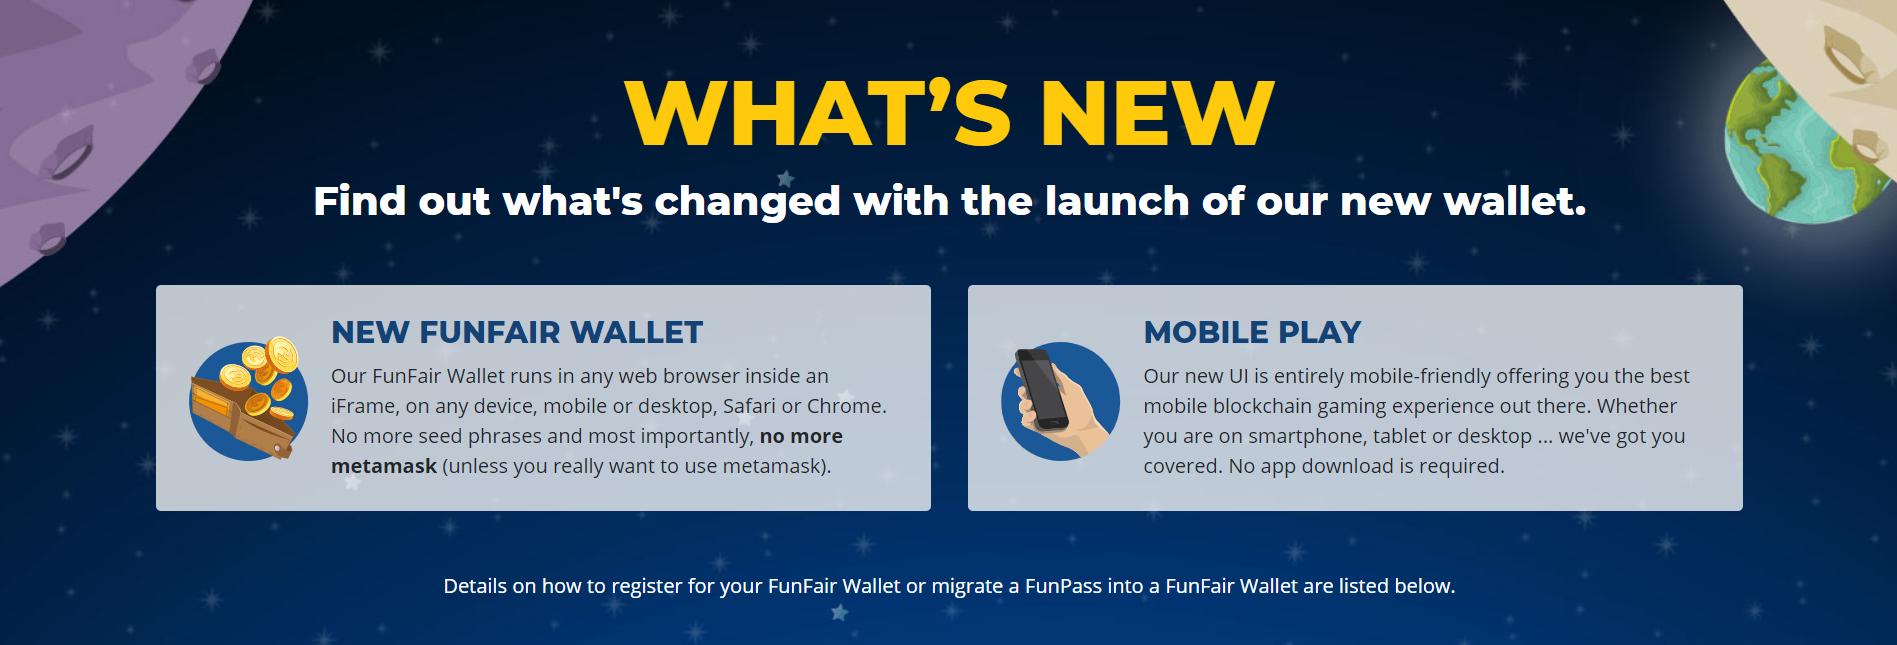 CryptoCasino FunFair Wallet Information